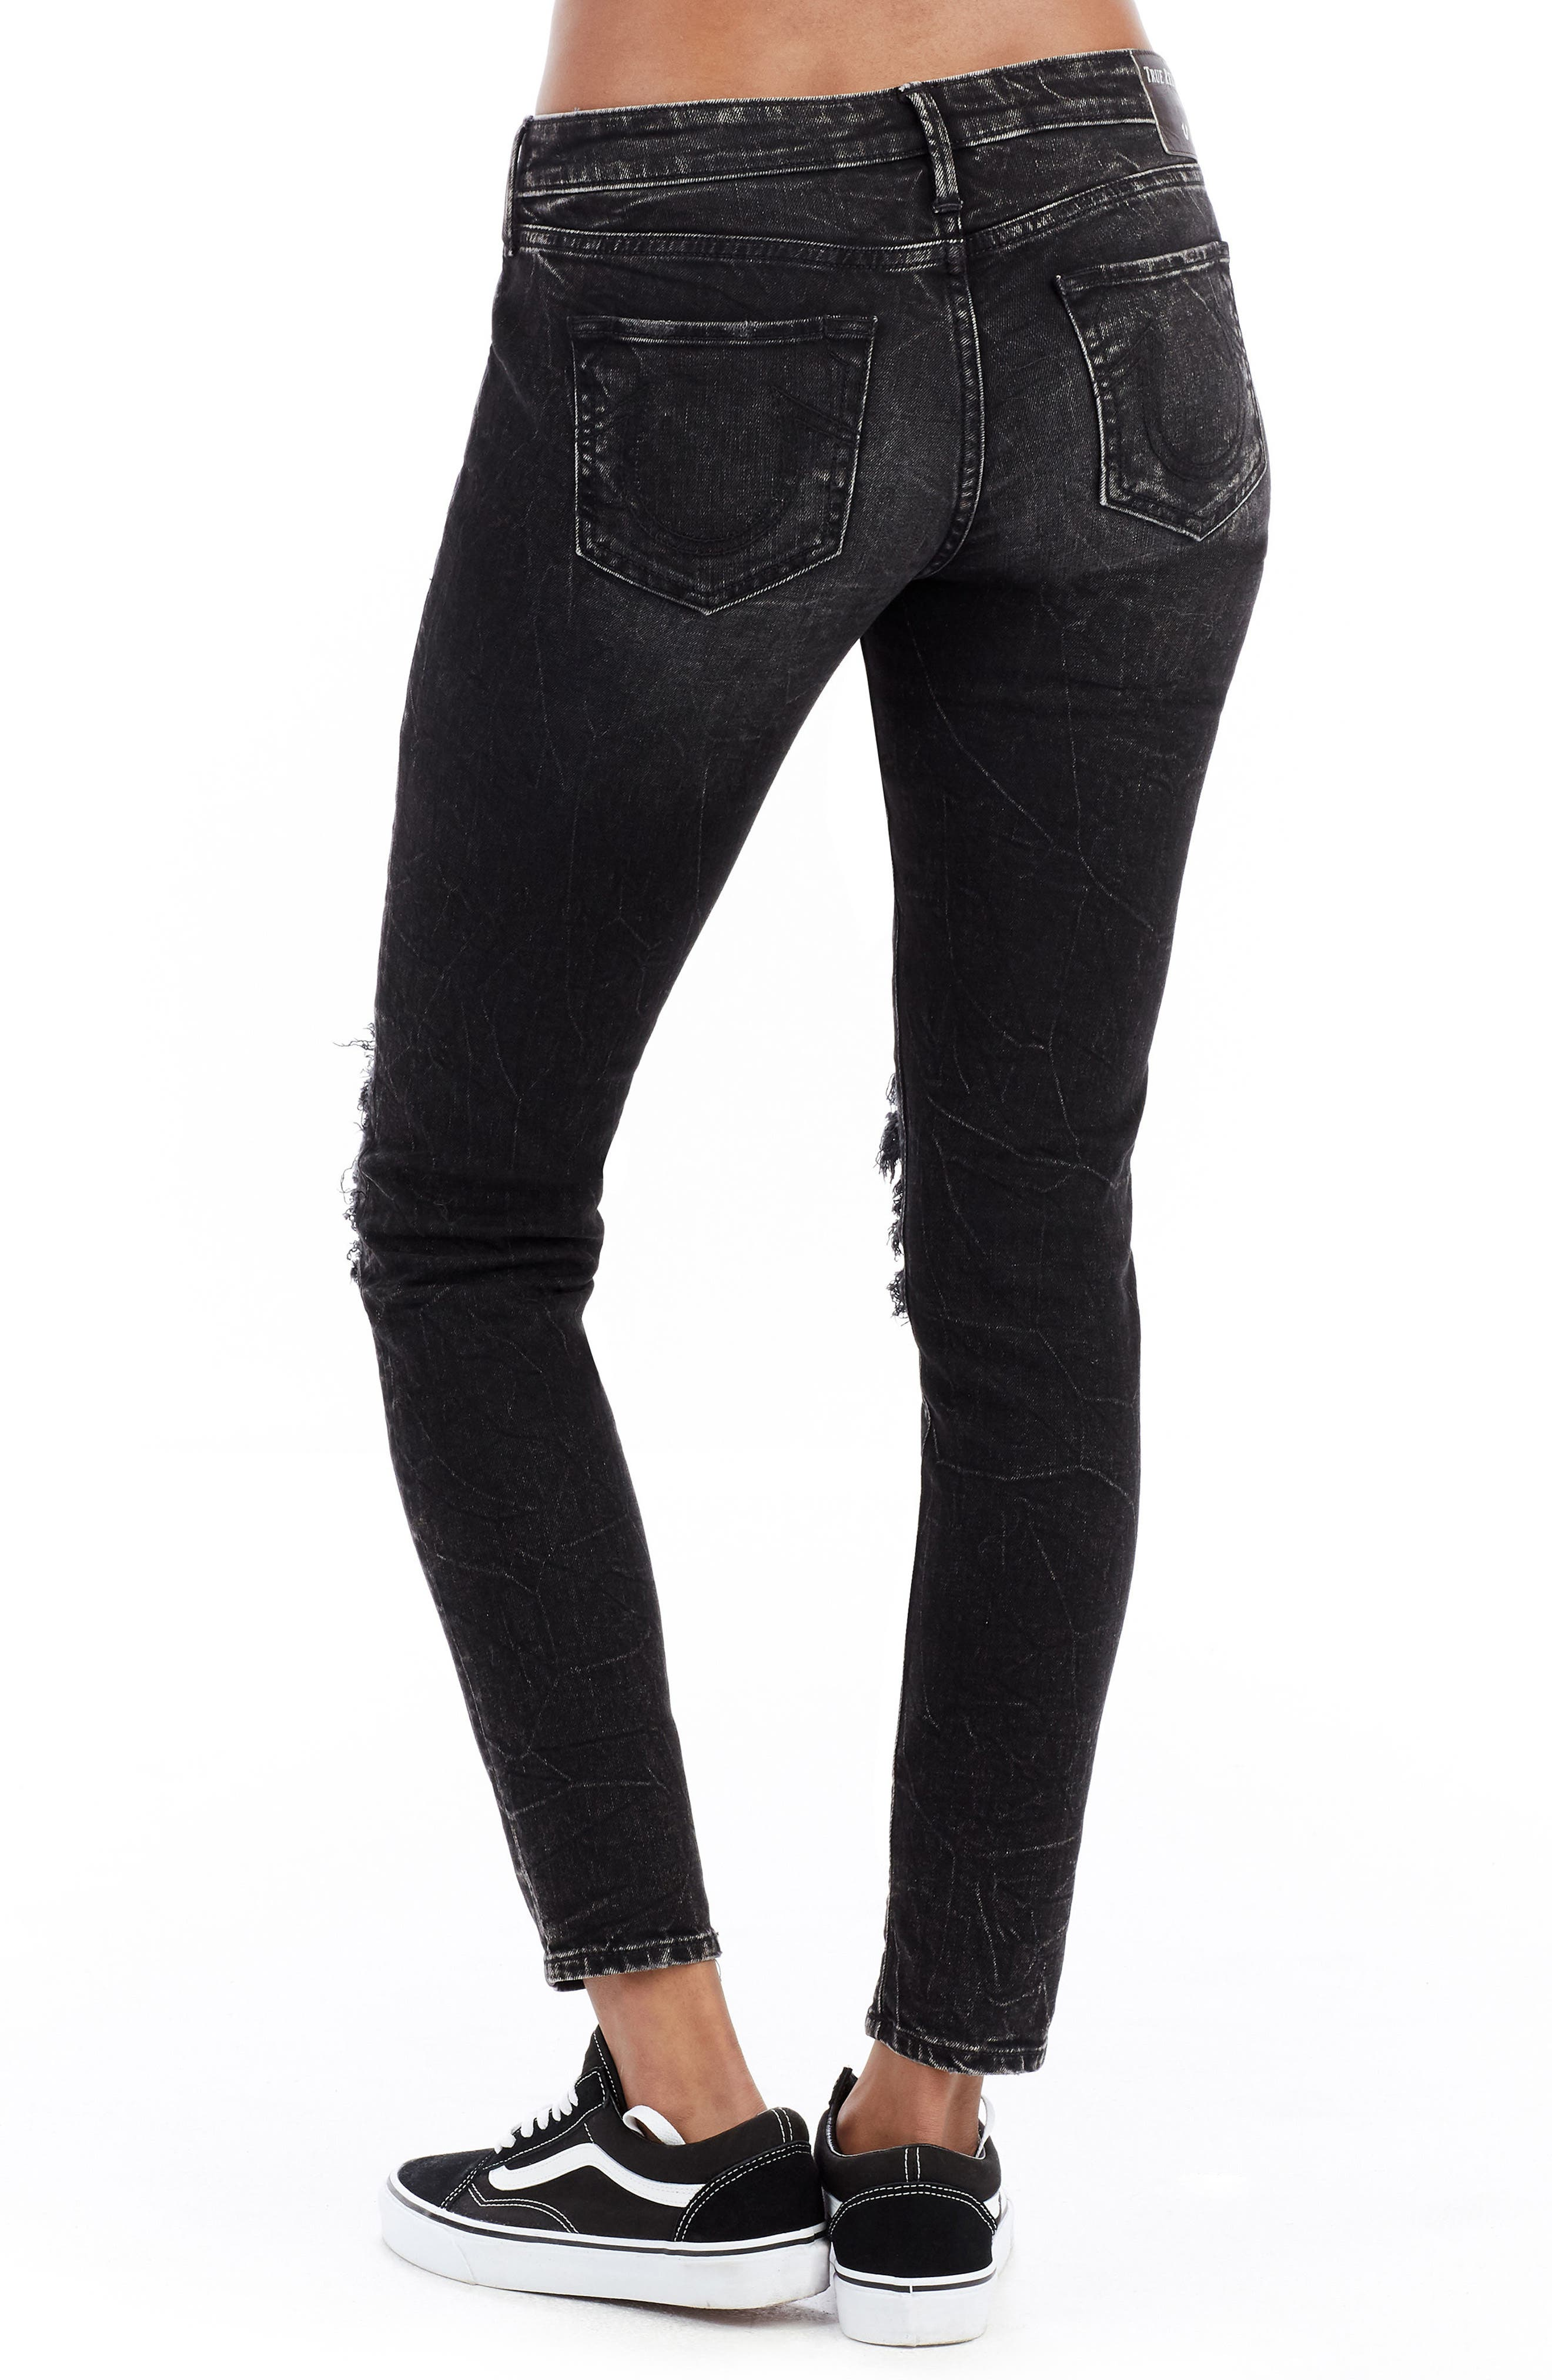 Halle Ankle Skinny Jeans,                             Alternate thumbnail 3, color,                             Raven Fever